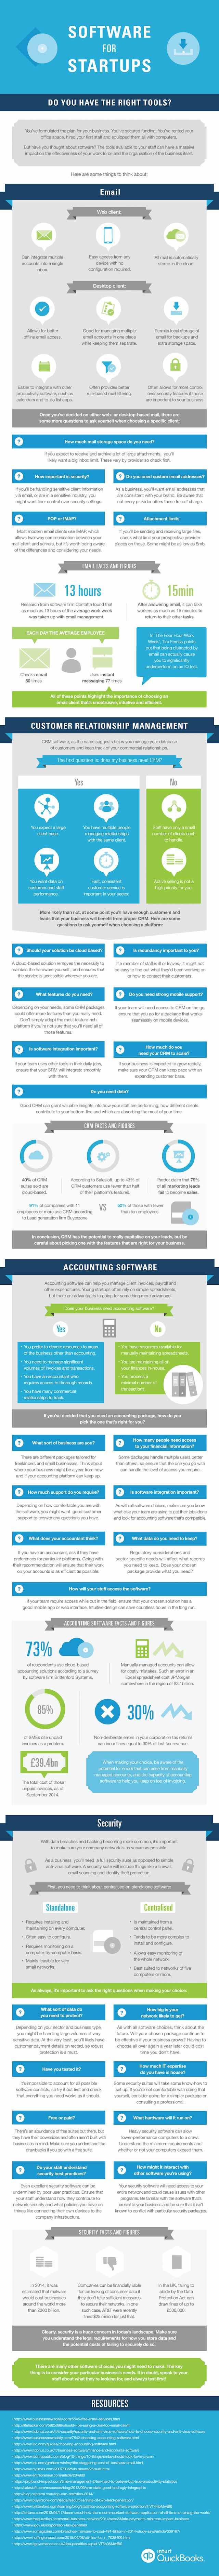 Software-for-Startups